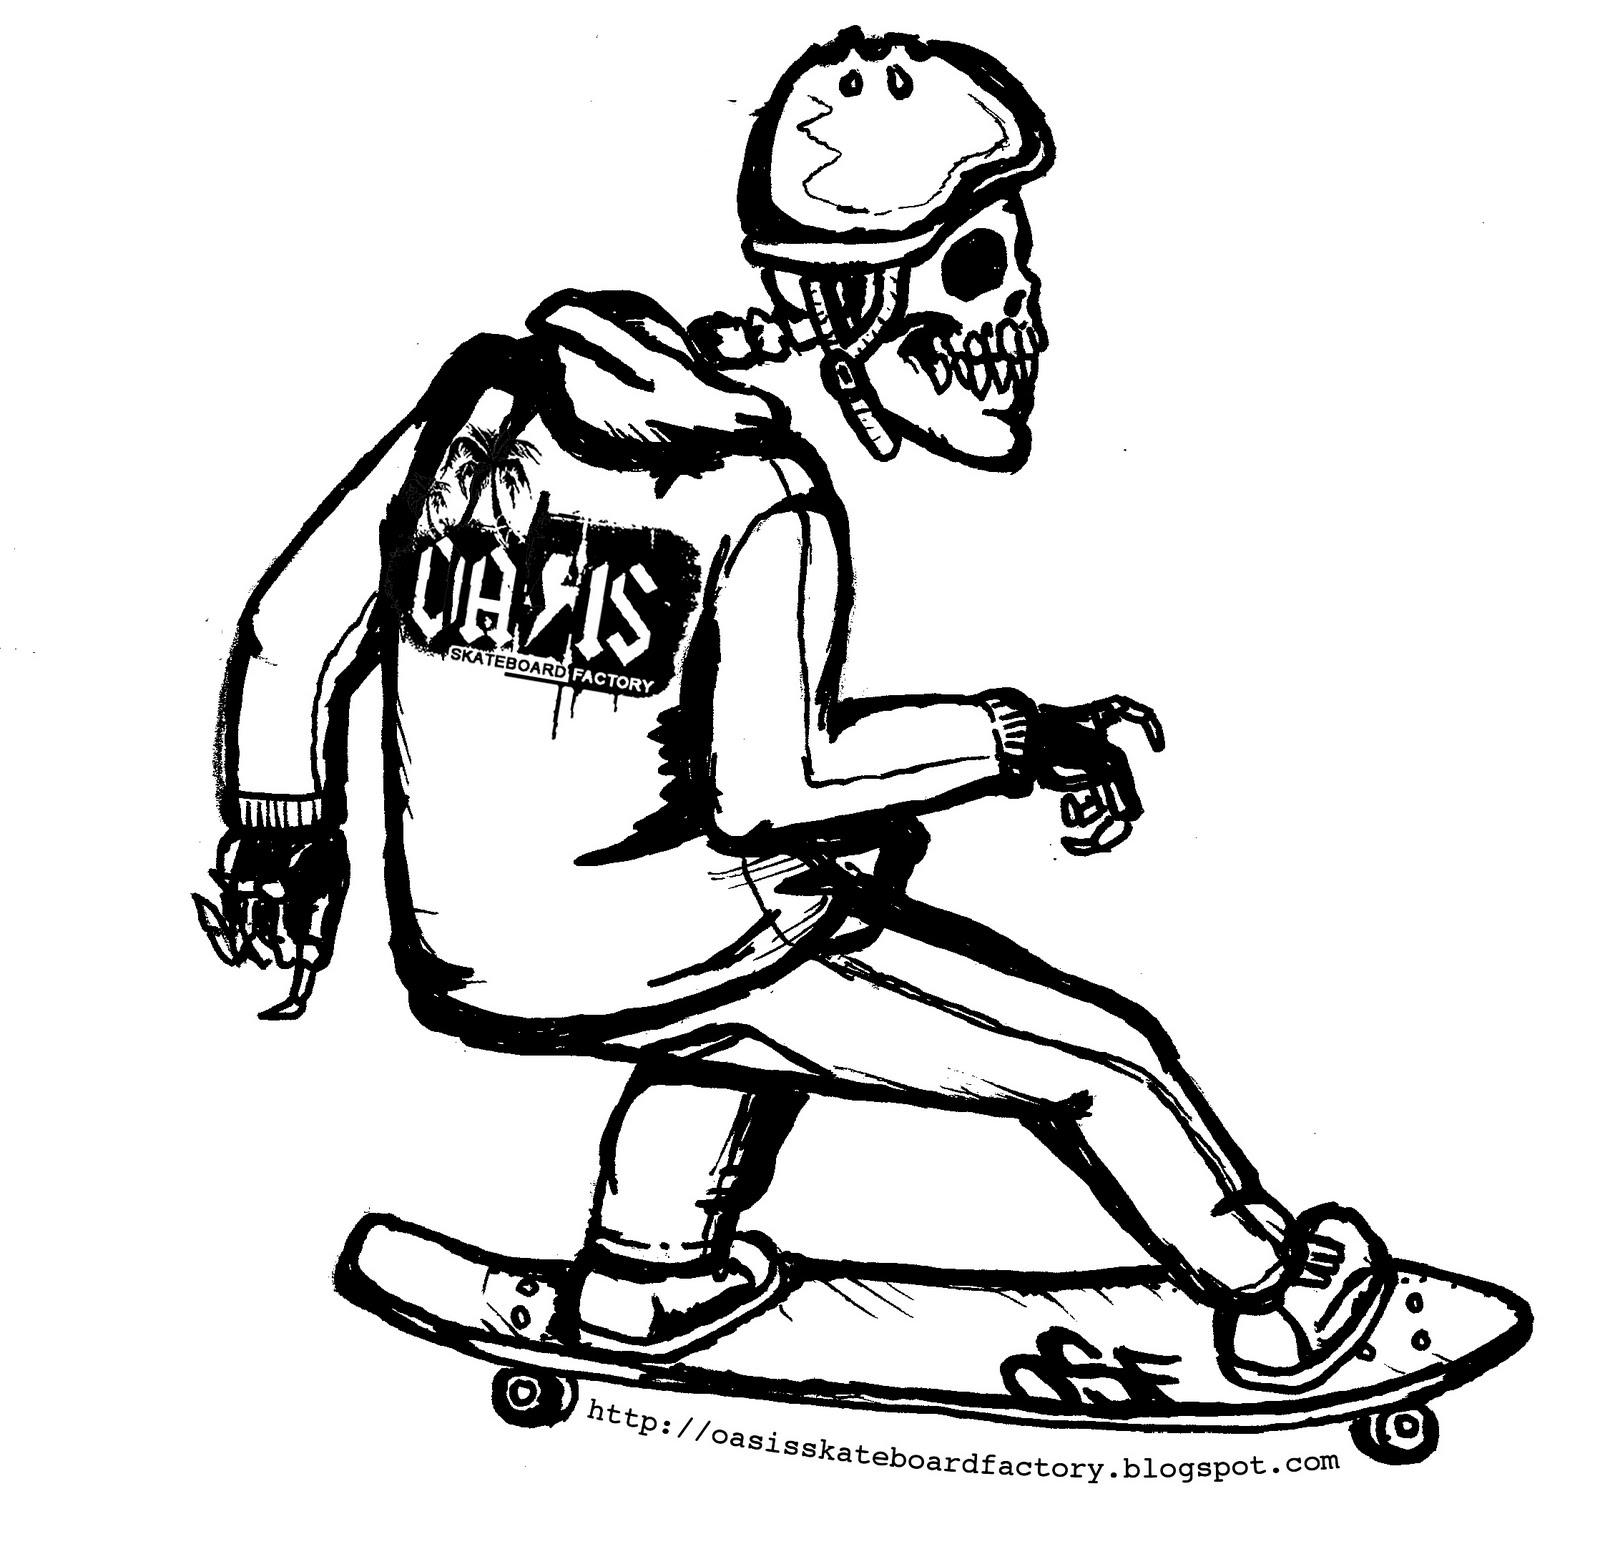 1600x1559 Oasis Skateboard Factory Slidin' Into Summer See Ya' In September!